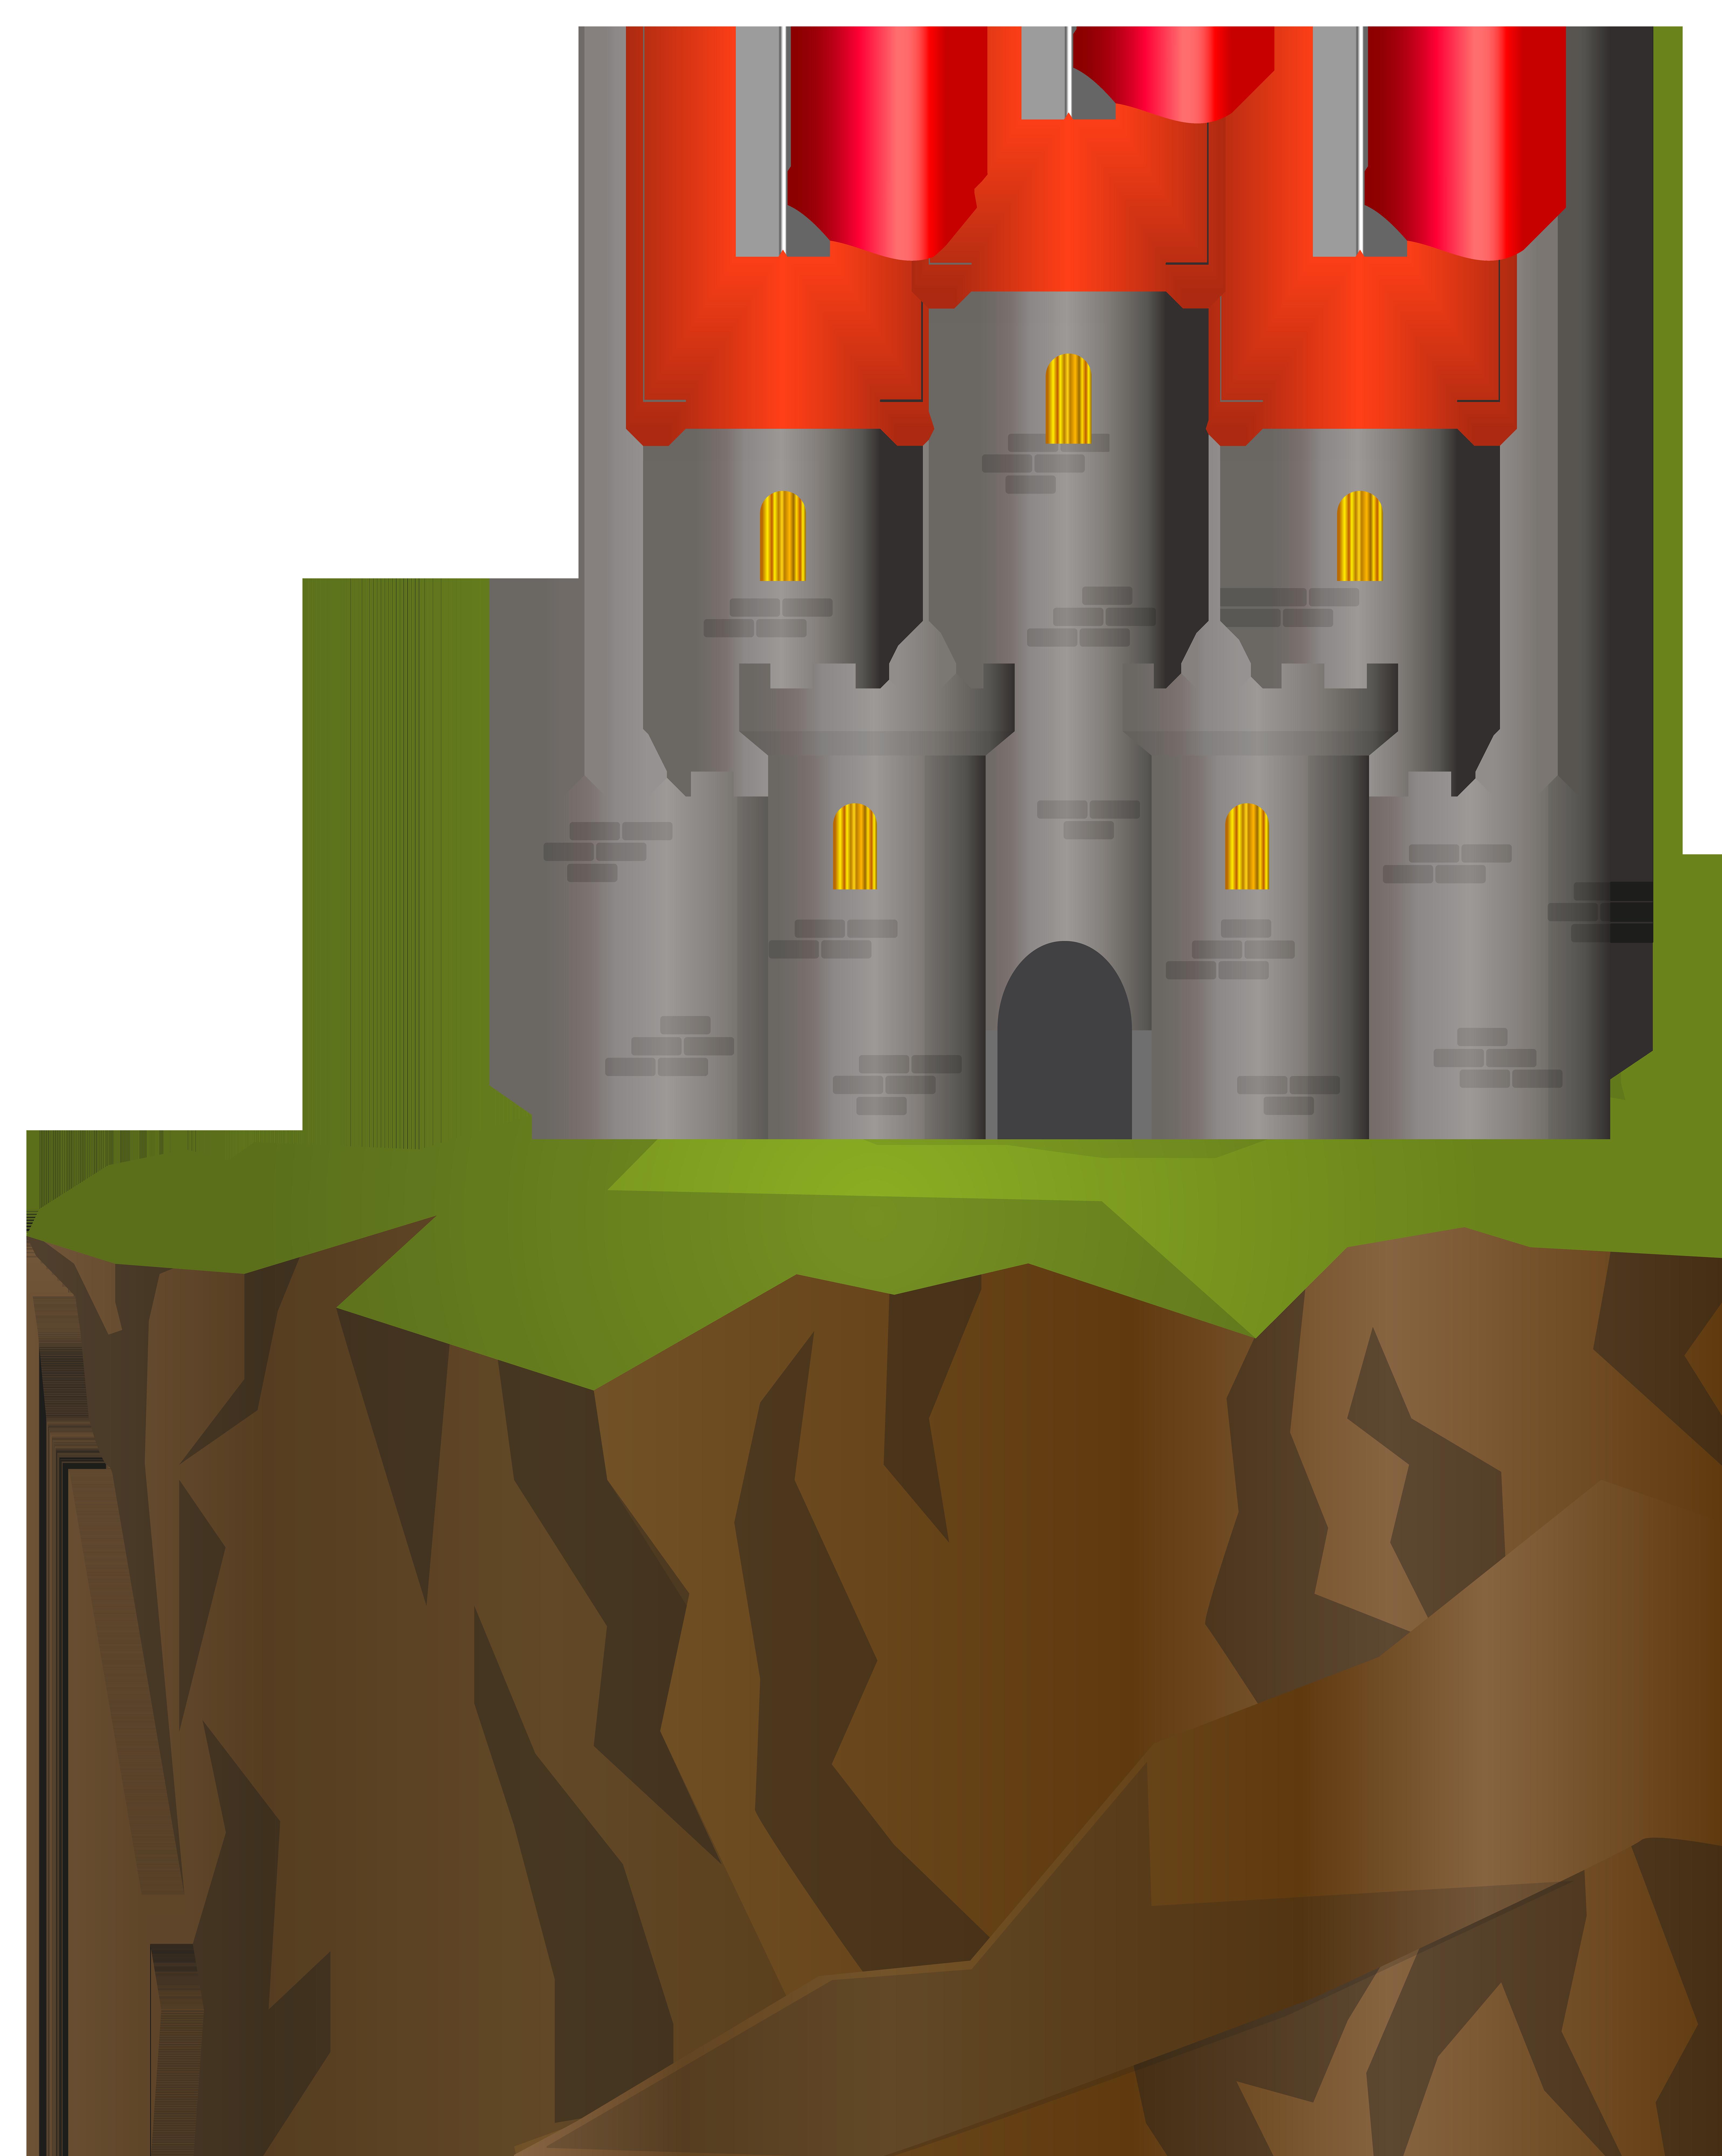 Clipart castle chocolate. Rock music clip art